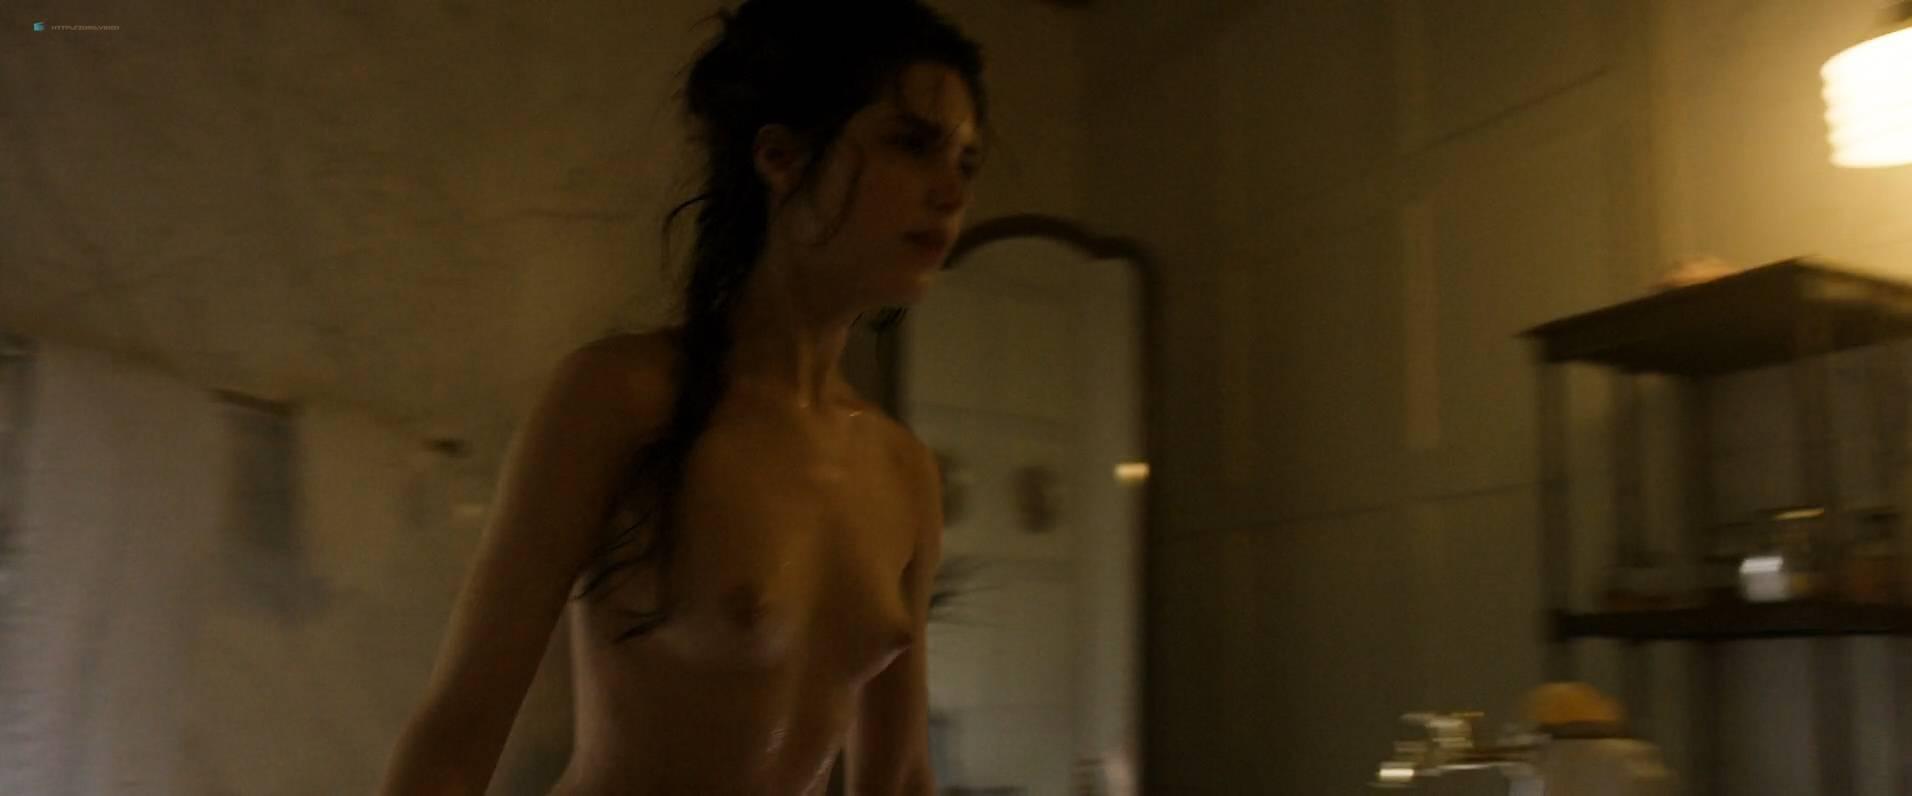 Michalina-Olszanska-nude-topless-Matilda-RU-2017-HD-1080p-WEb-007.jpg